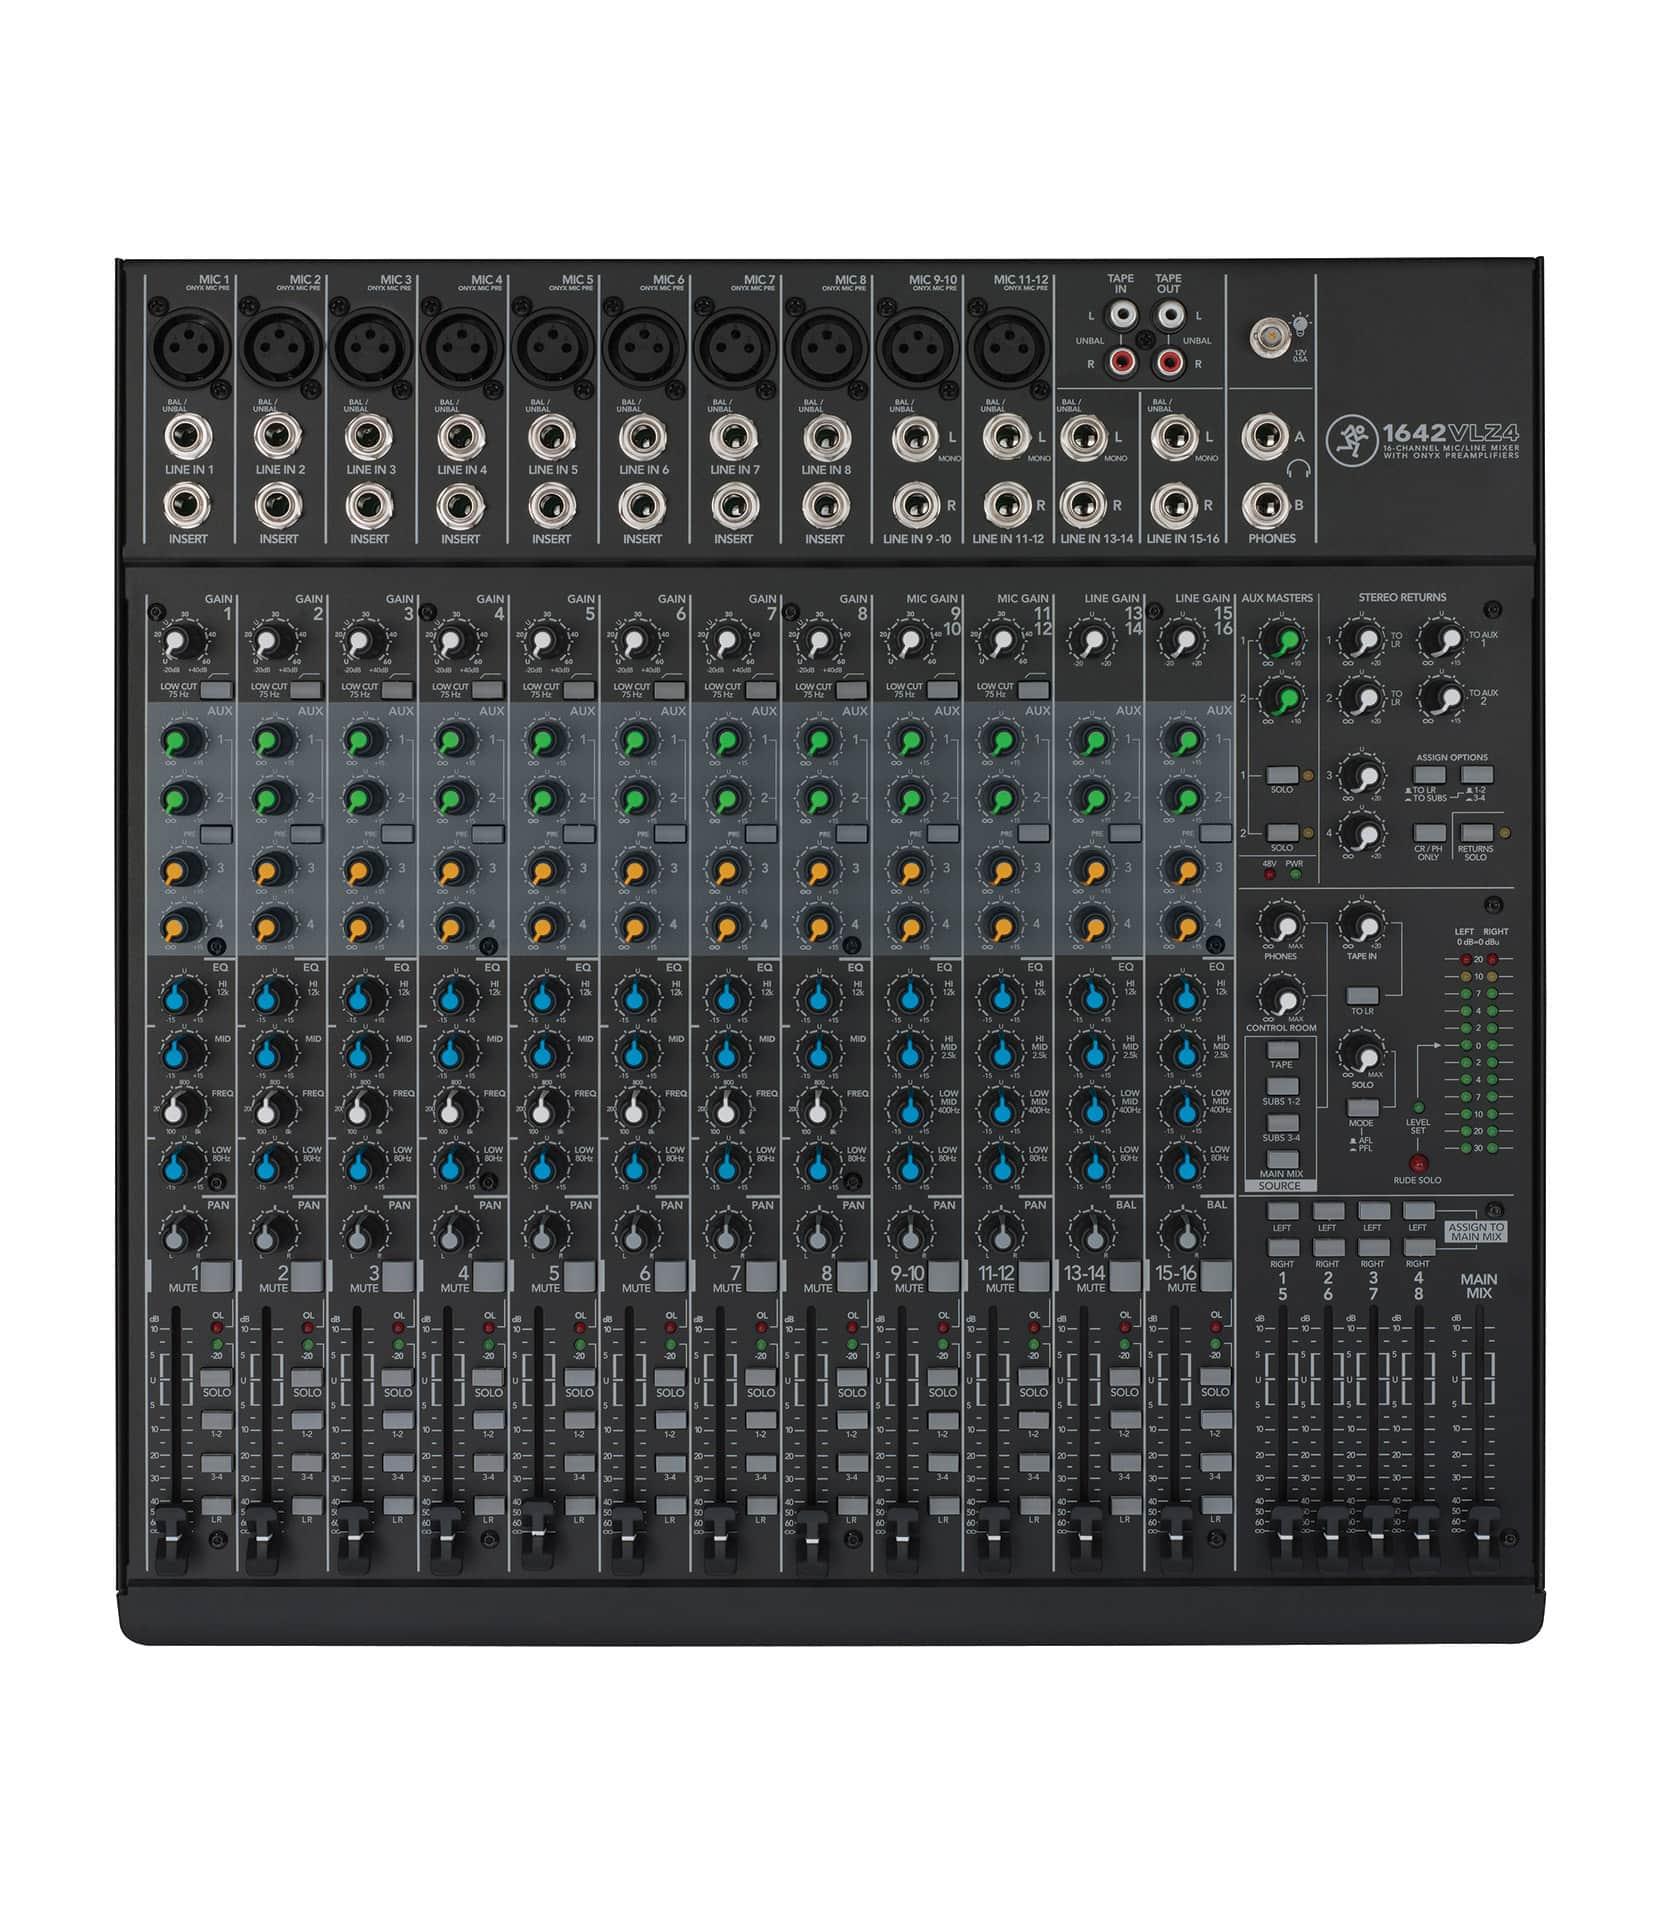 1642VLZ4 16 Channel Compact 4 bus Mixer